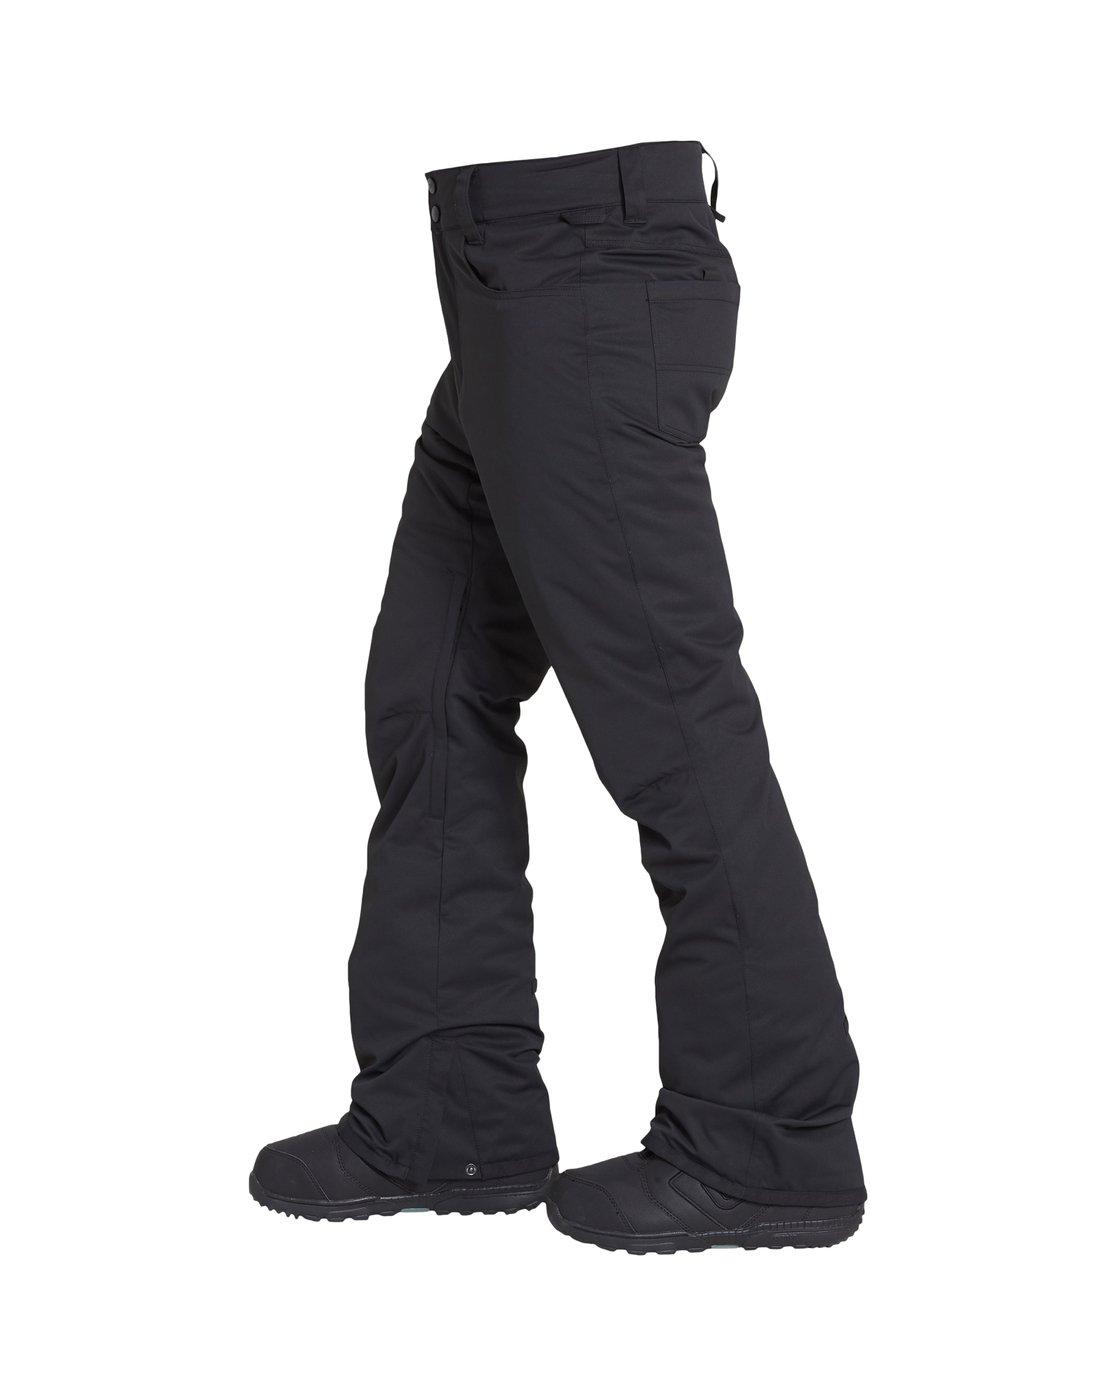 Billabong Mens Outsider Insulated Snow Pant